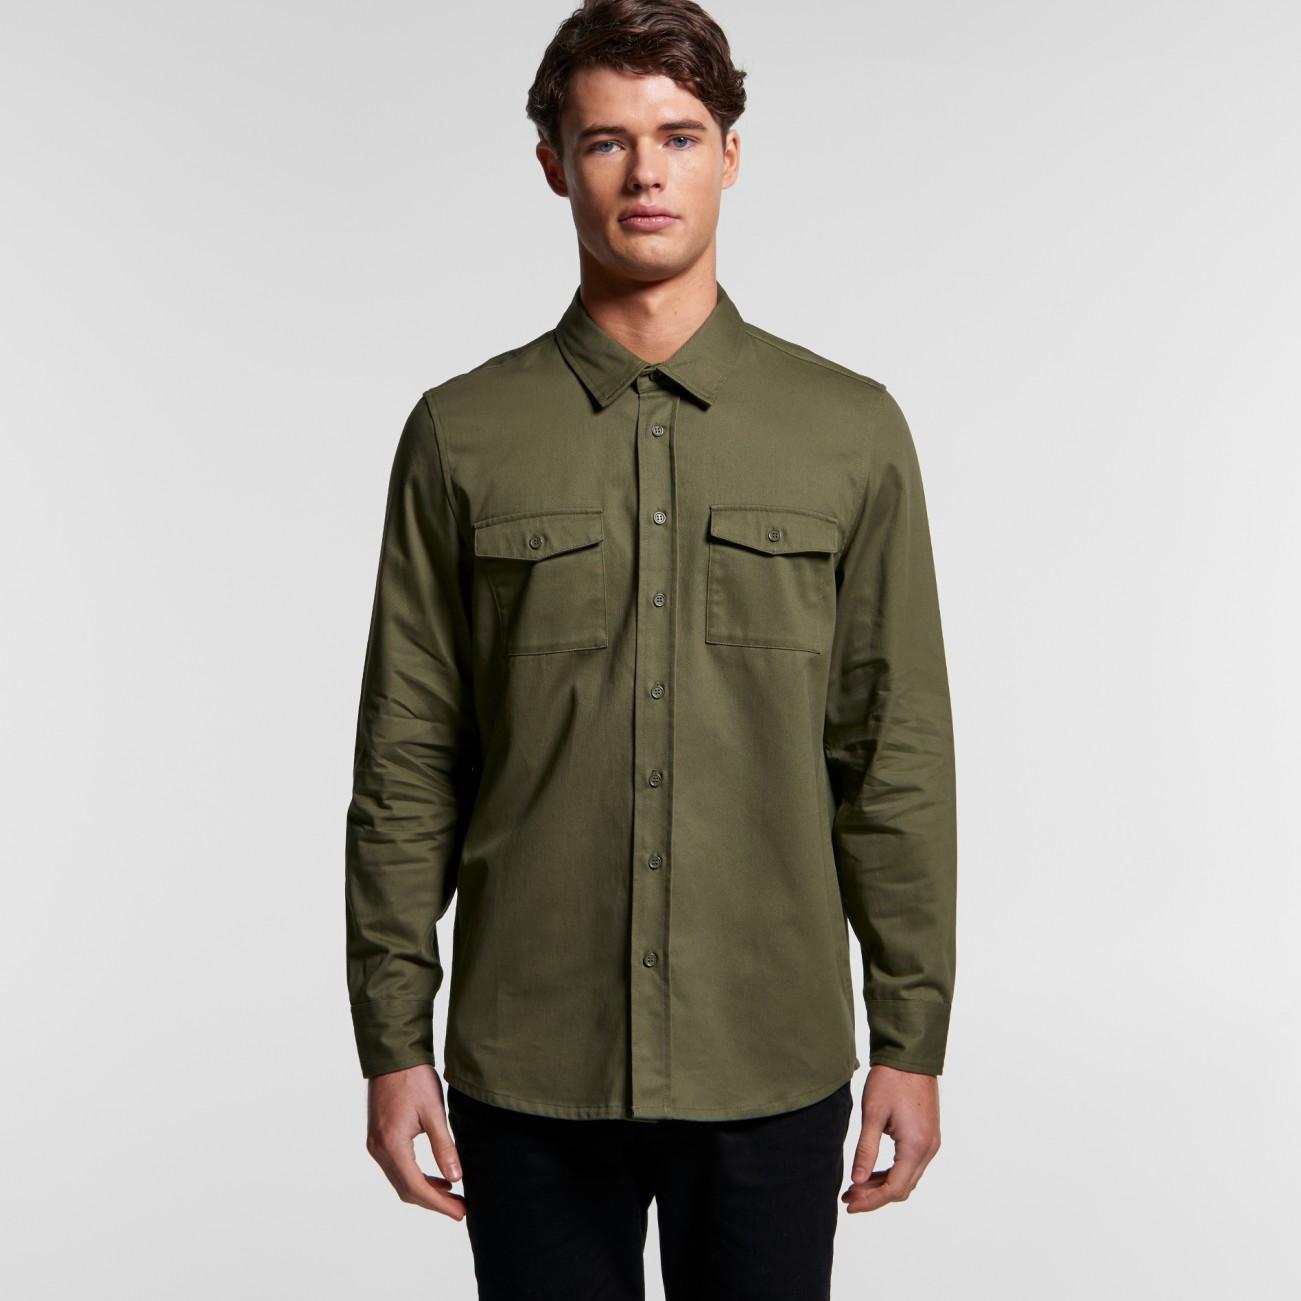 5412_military_shirt_front_3.jpg